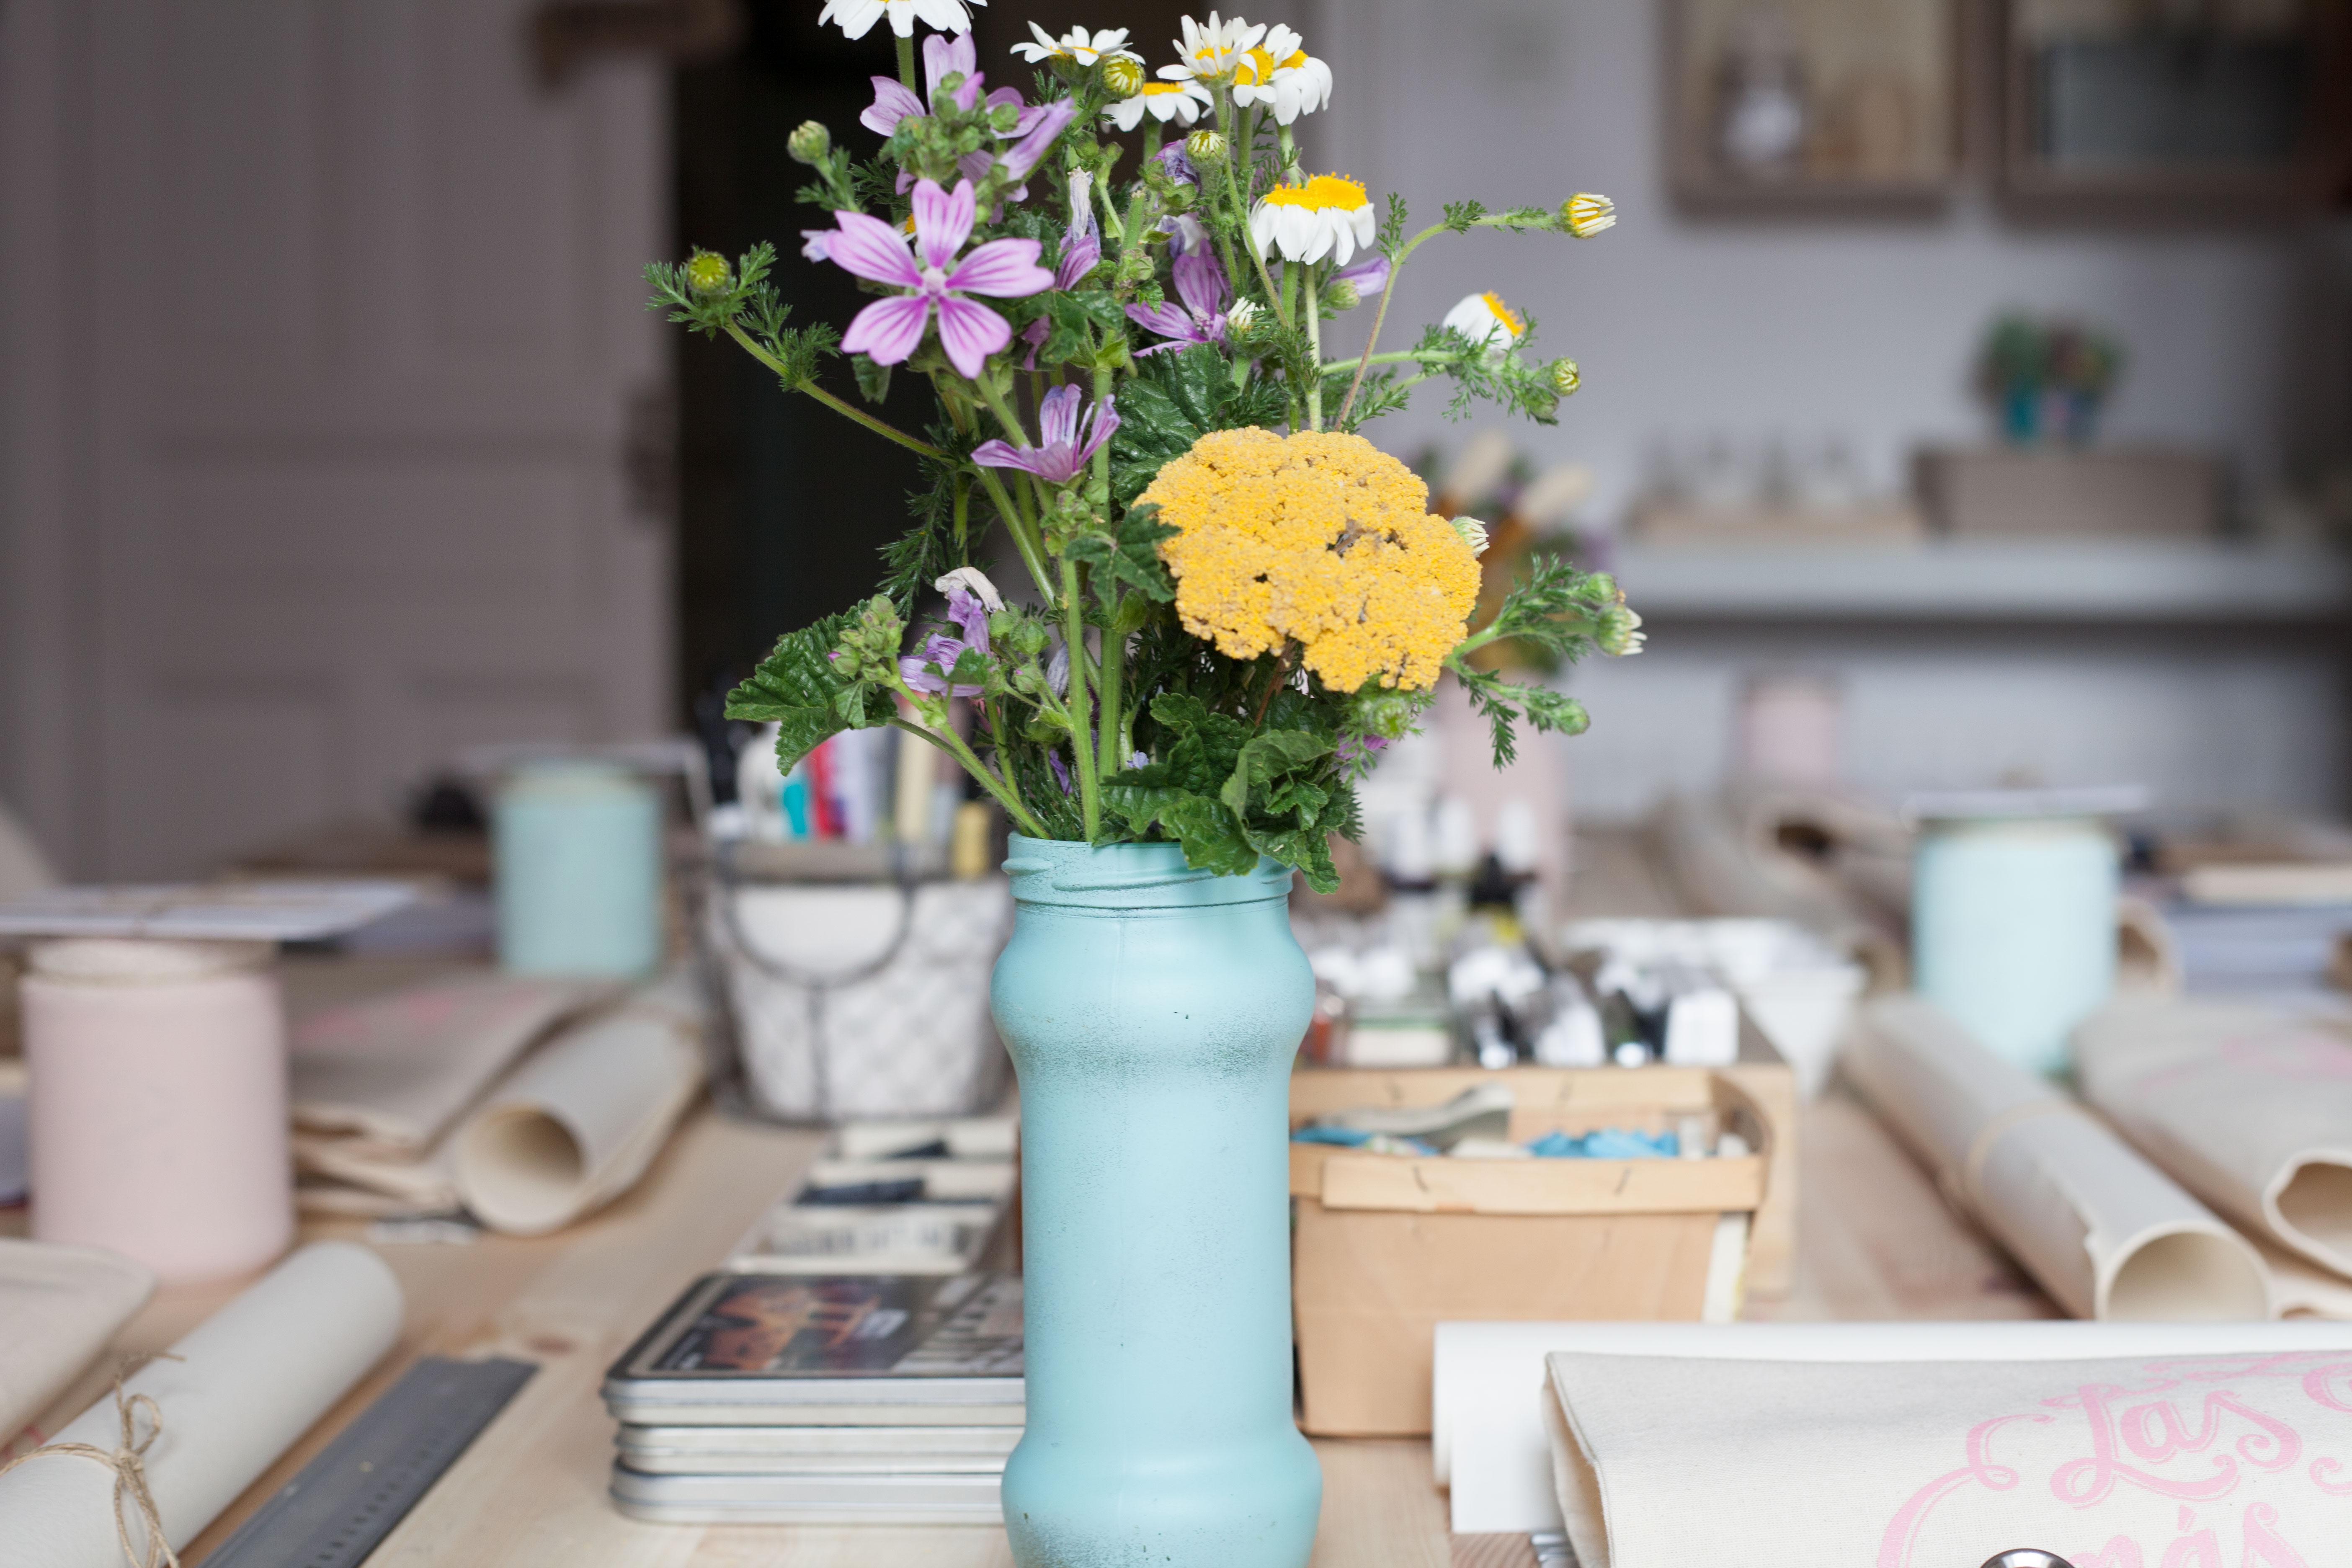 Oui Oui-mi evento handmade-lettering bodas-packaging bodas-centros flores diy (9)